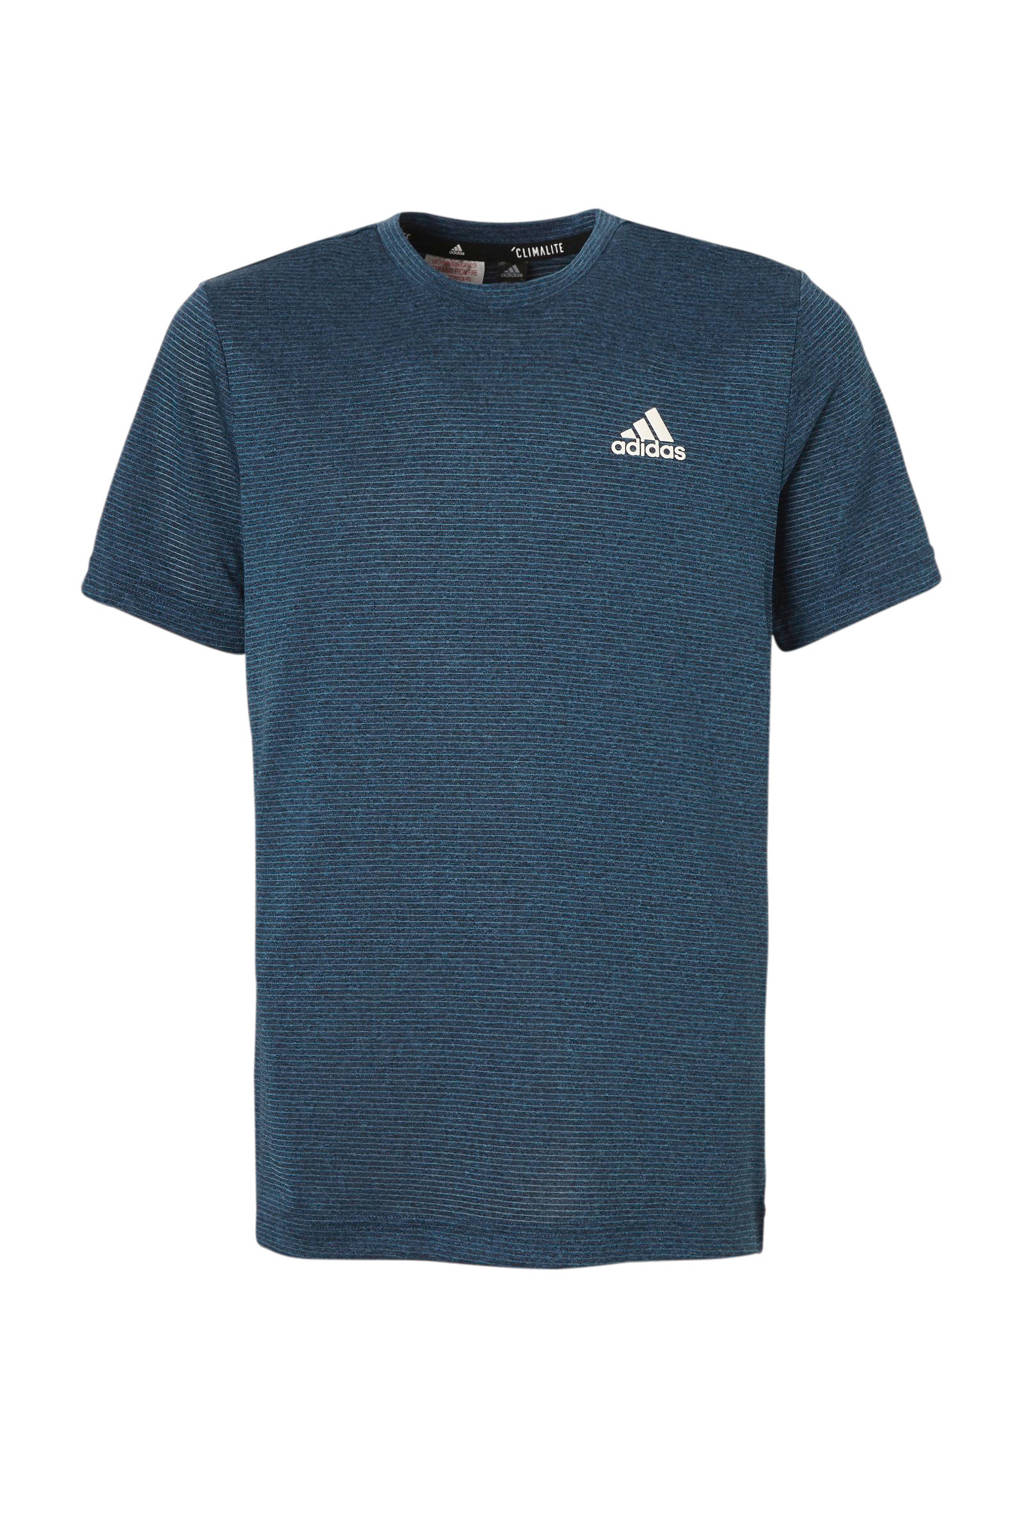 adidas performance   performance sport T-shirt blauw, Blauw